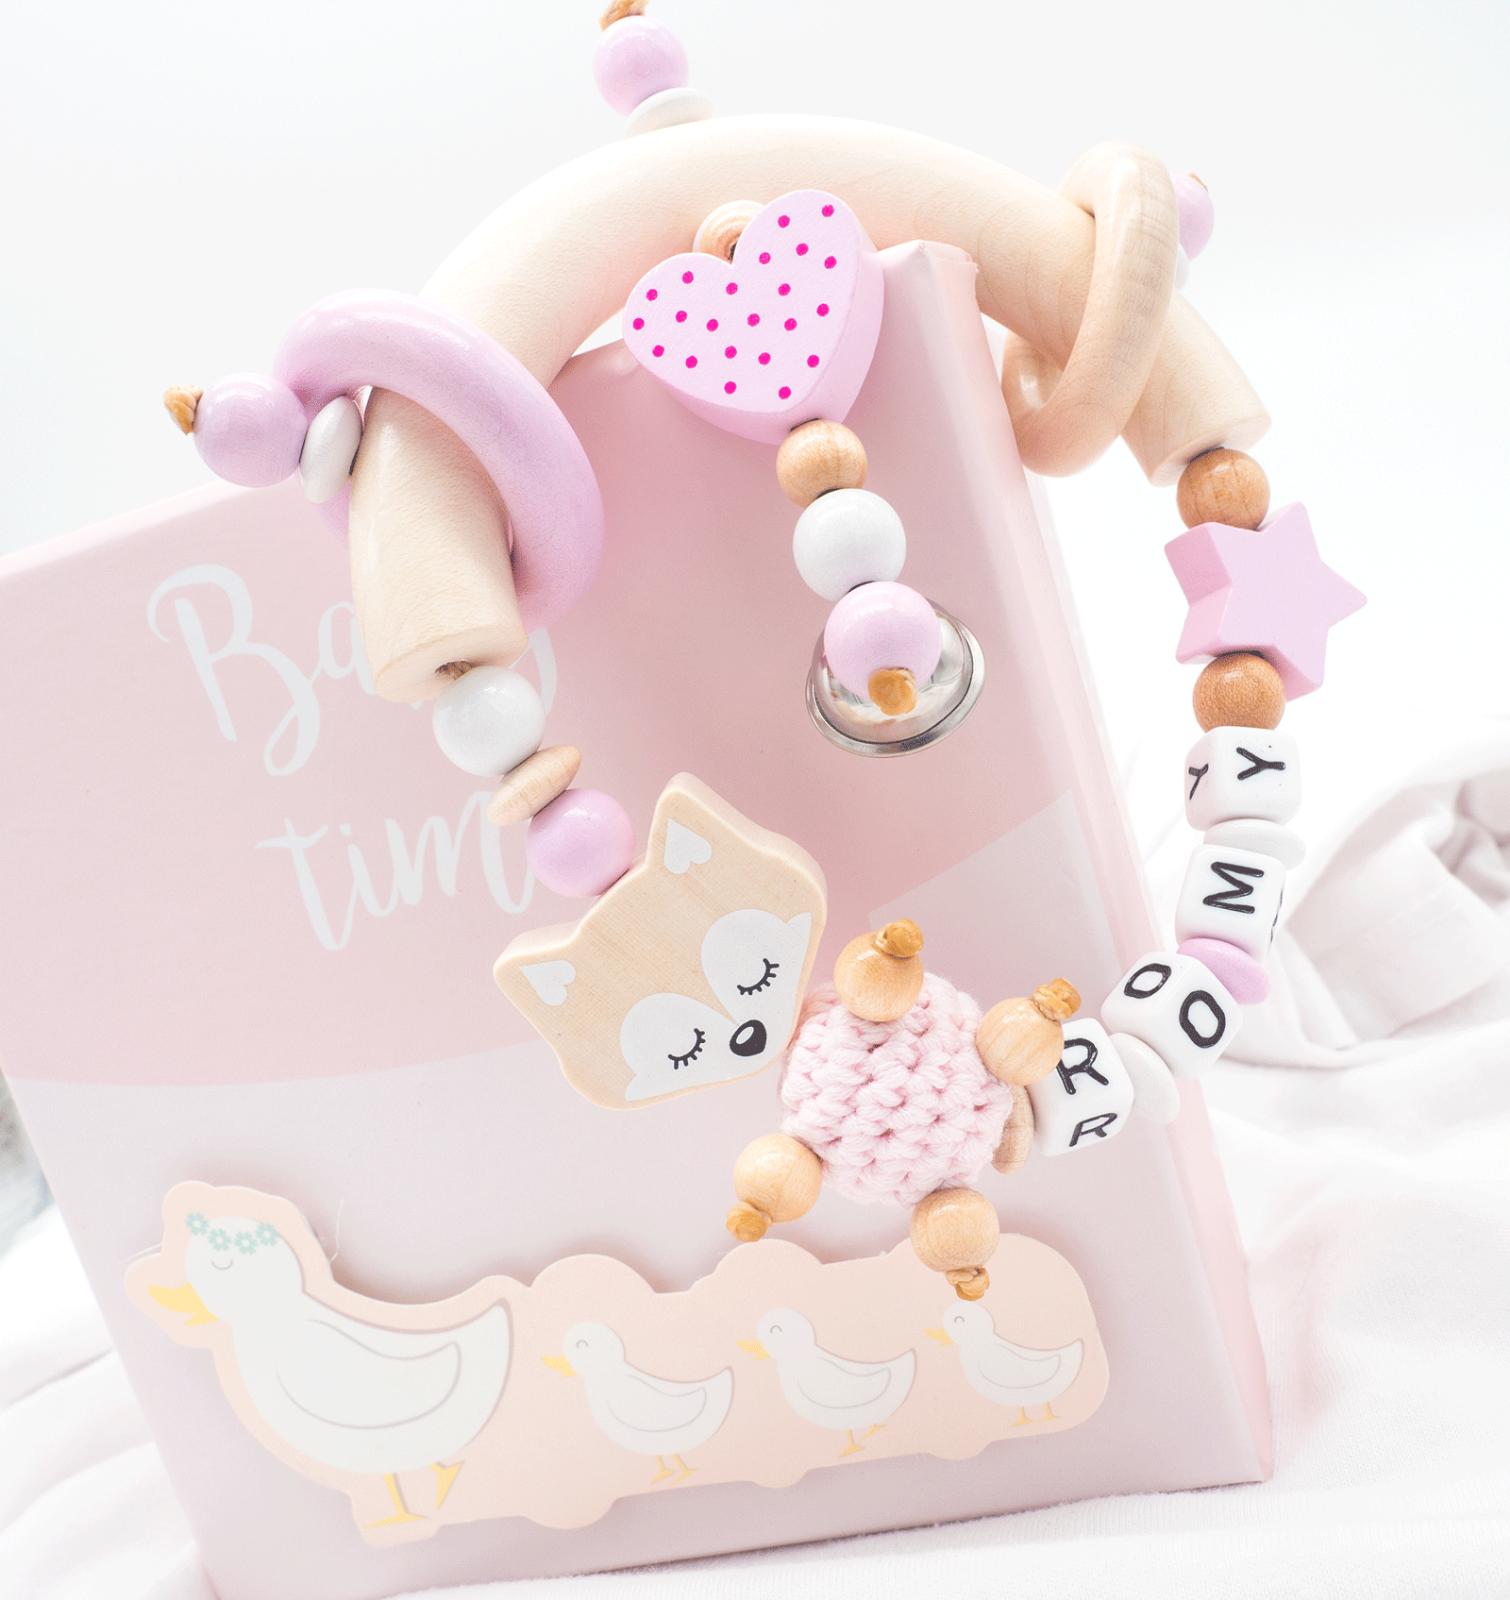 Greifling mit Namen + Glocke ♥ Holz ♥ XL Fuchs ♥Baby Mädchen Geschenk rosa natur